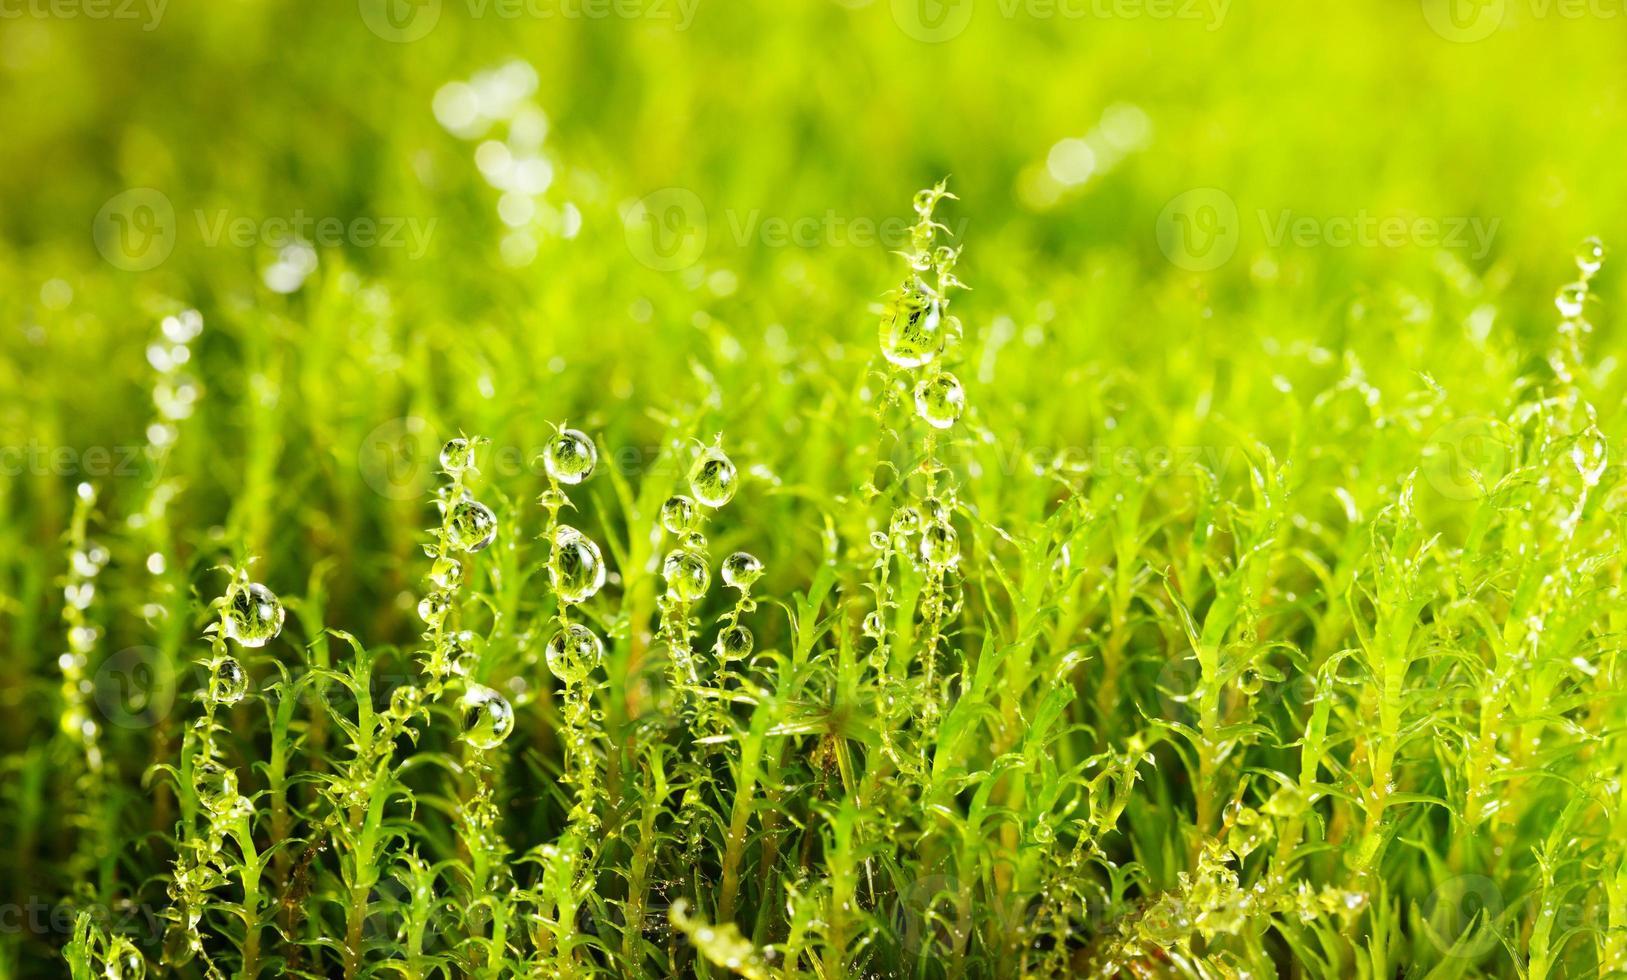 groen mos en waterdruppels foto